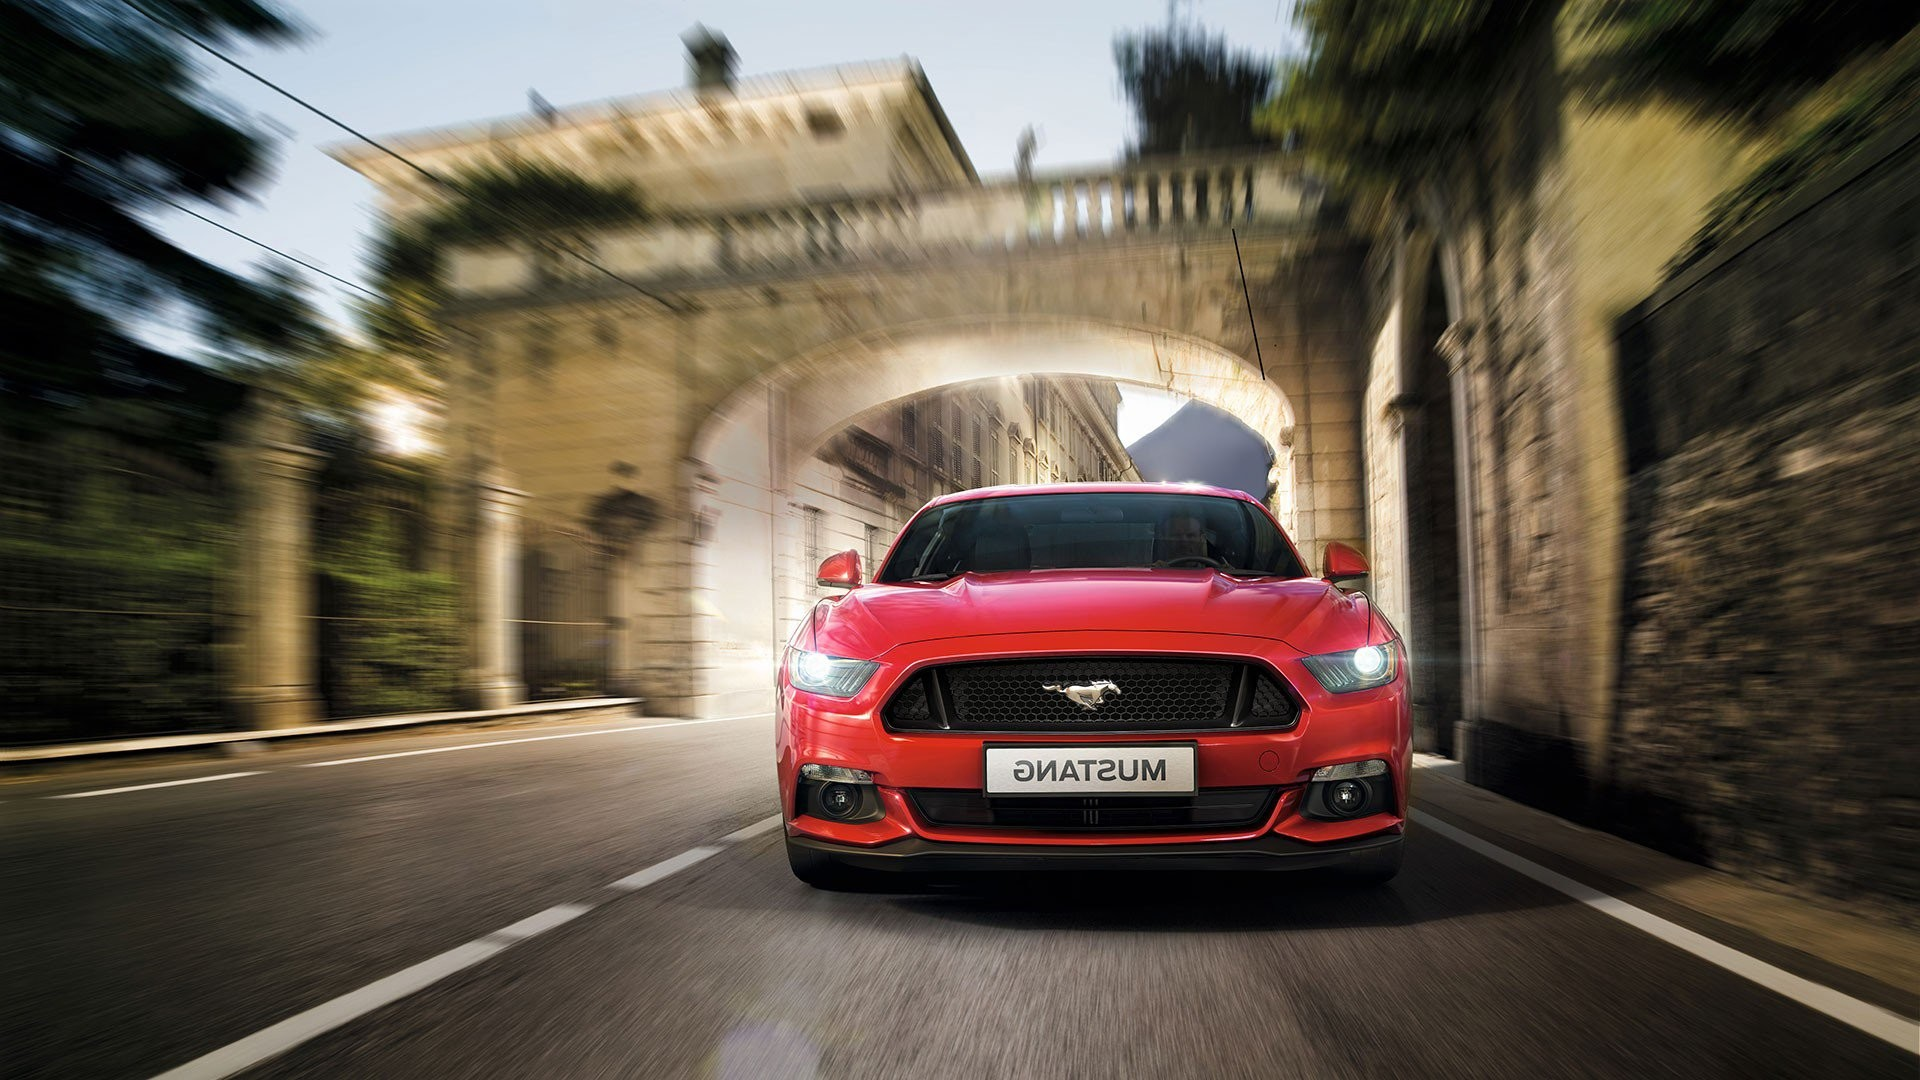 2018 Best Car Wallpapers: 2018 Mustang Wallpaper (57+ Images